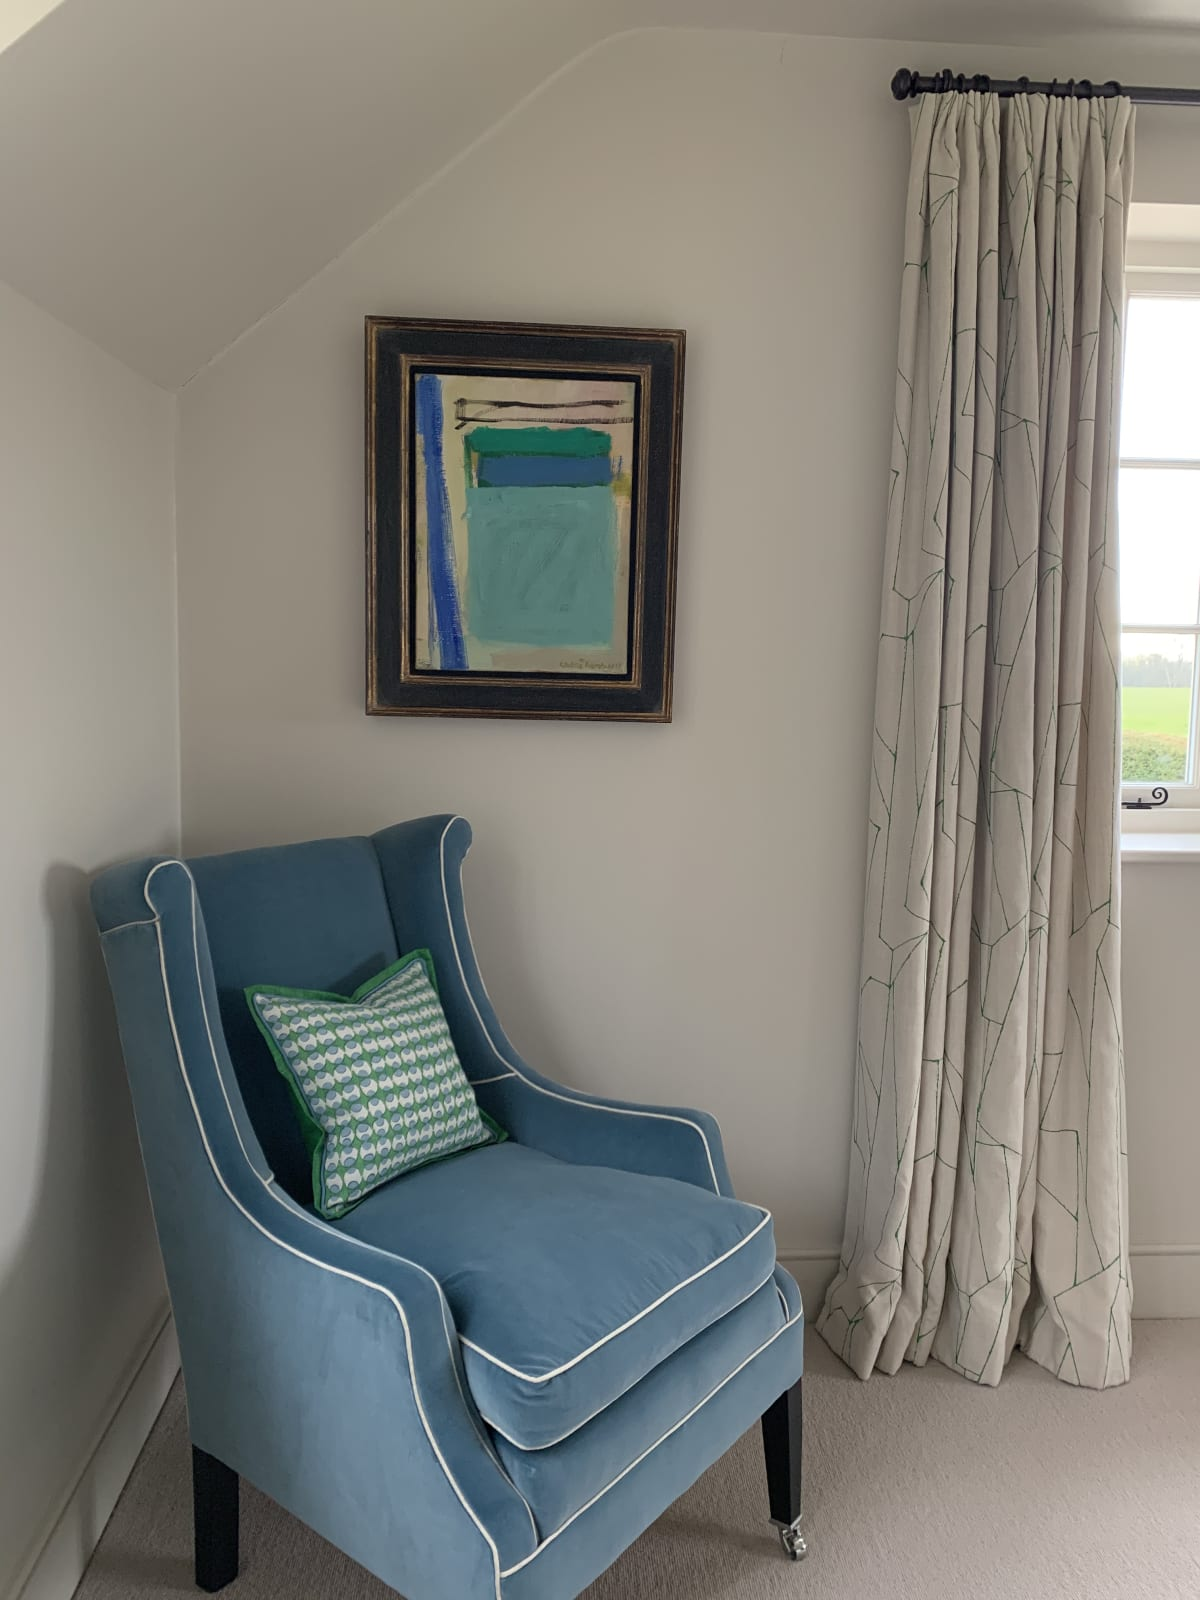 An abstract Chloe Lamb in a bedroom